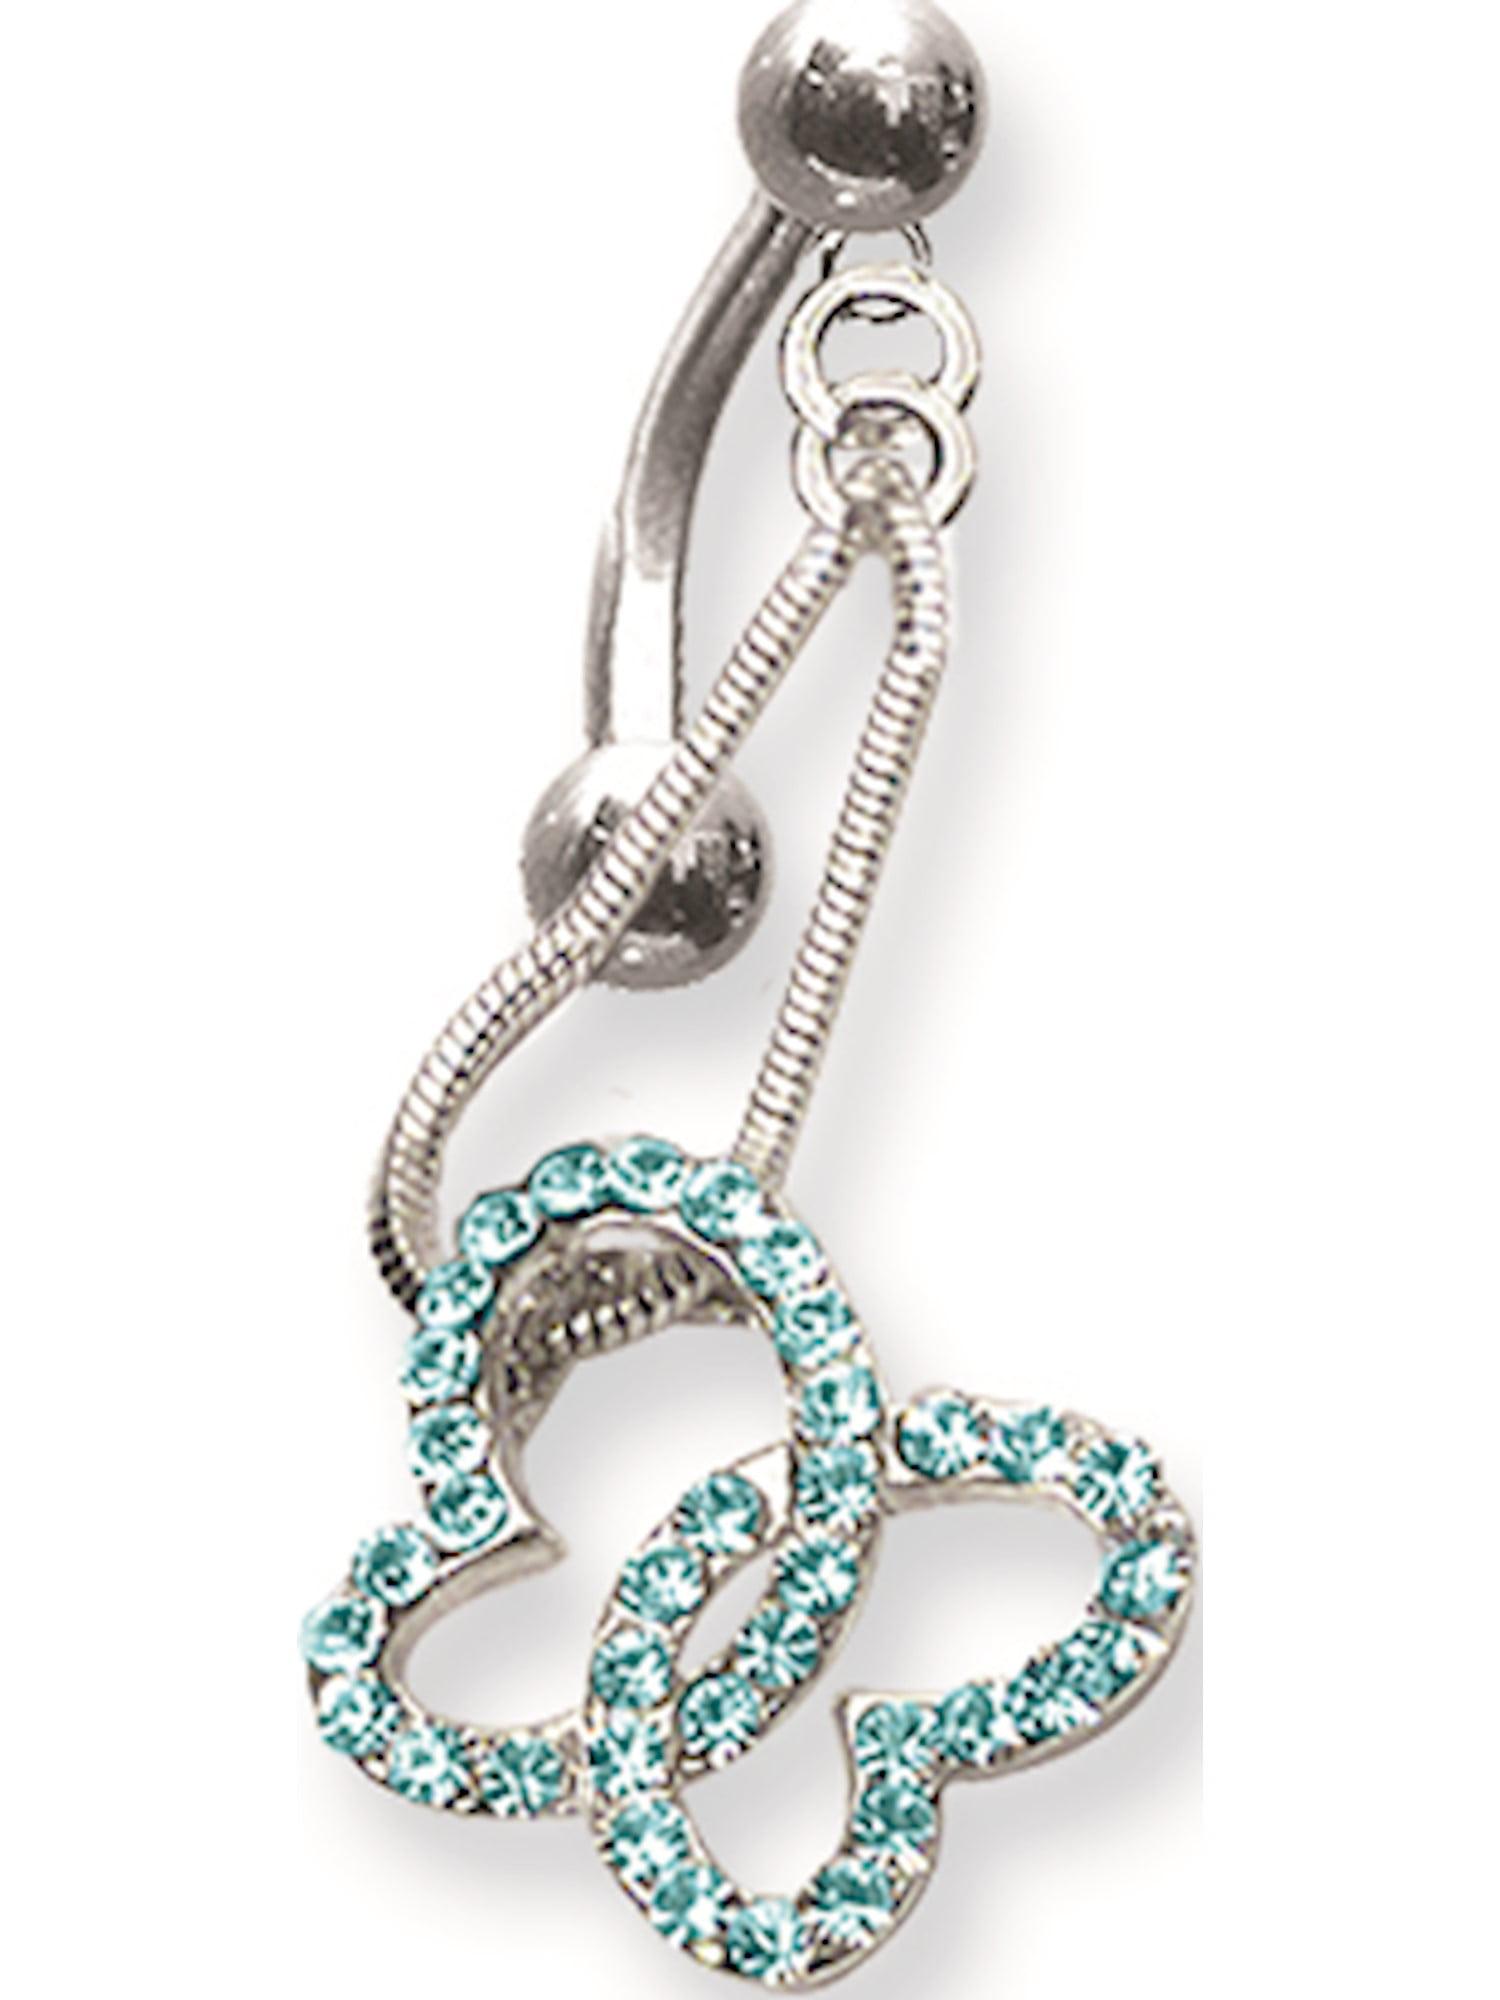 Long Curv Jewelry by Sweet Pea SGSS Curv BB w Fancy Gem Top Dangle 14G 11mm 13//32 1.6mm